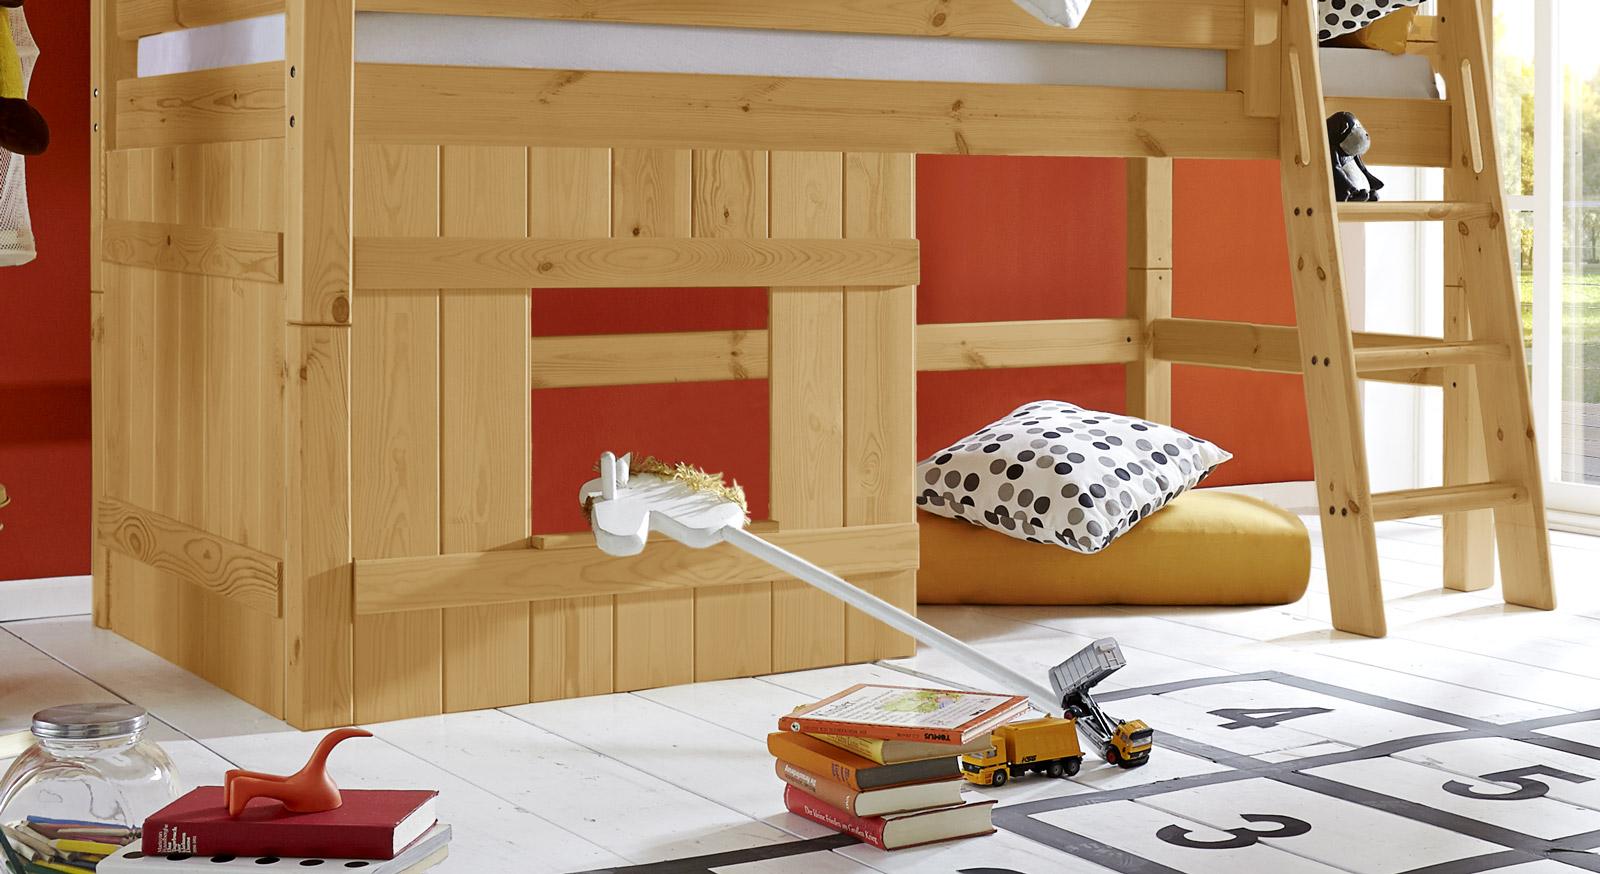 Holzverkleidung Kids Paradise Kiefer gelaugt